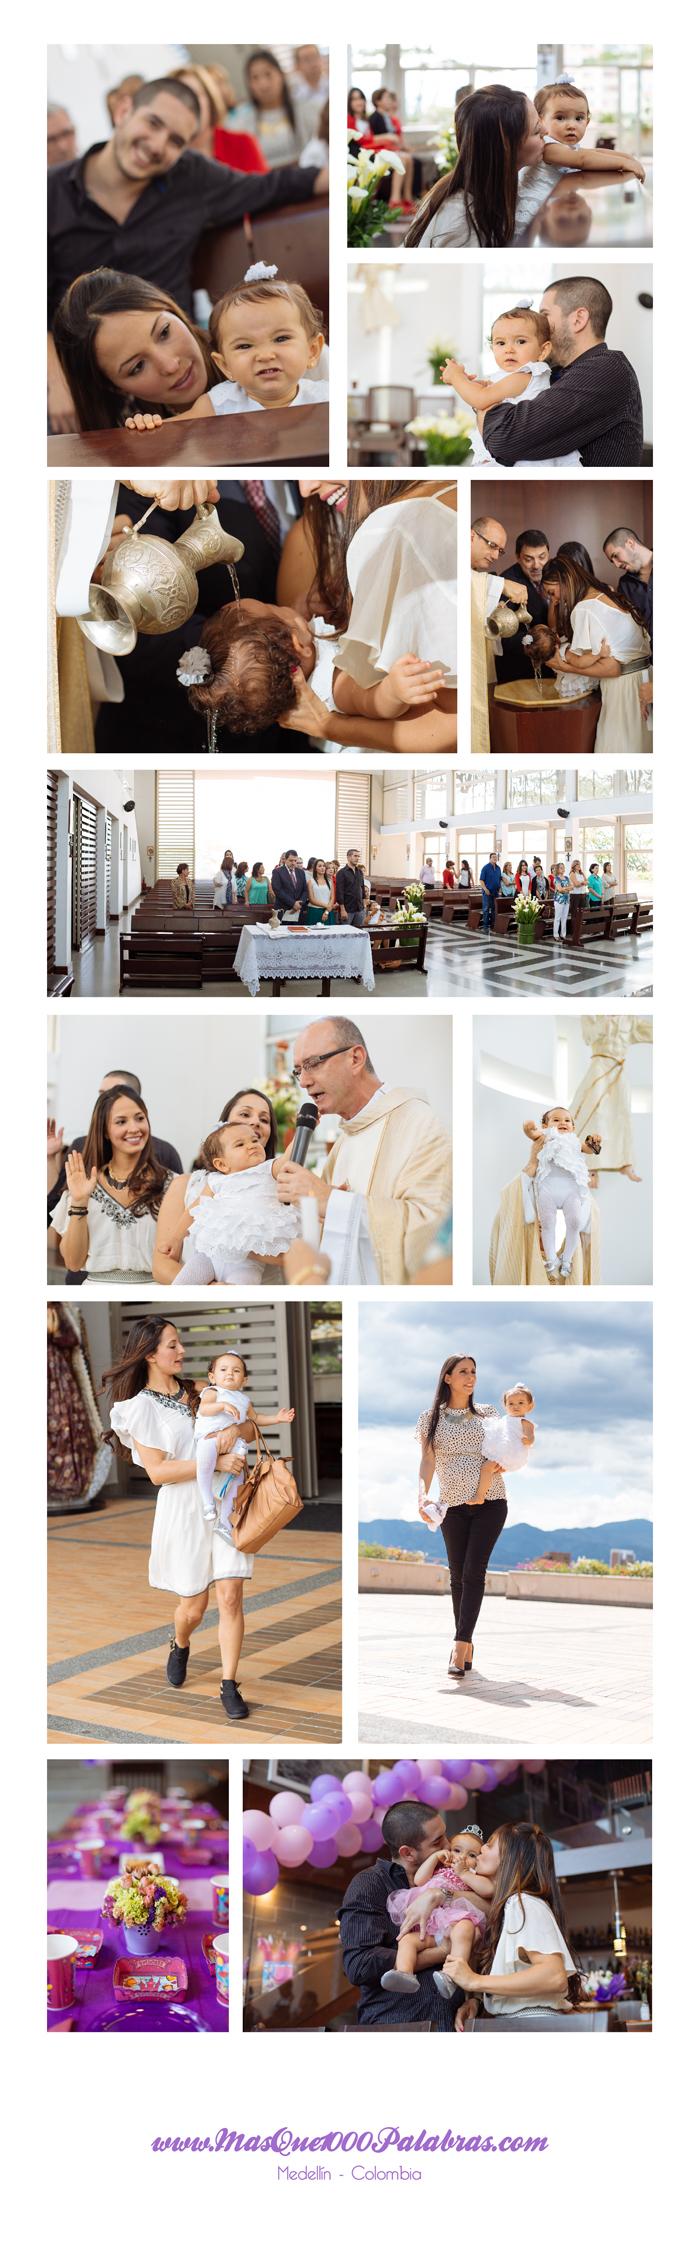 bautizo, iglesia, padre marianito, medellin, the pot, masque1000palabras, celebración, fotografía